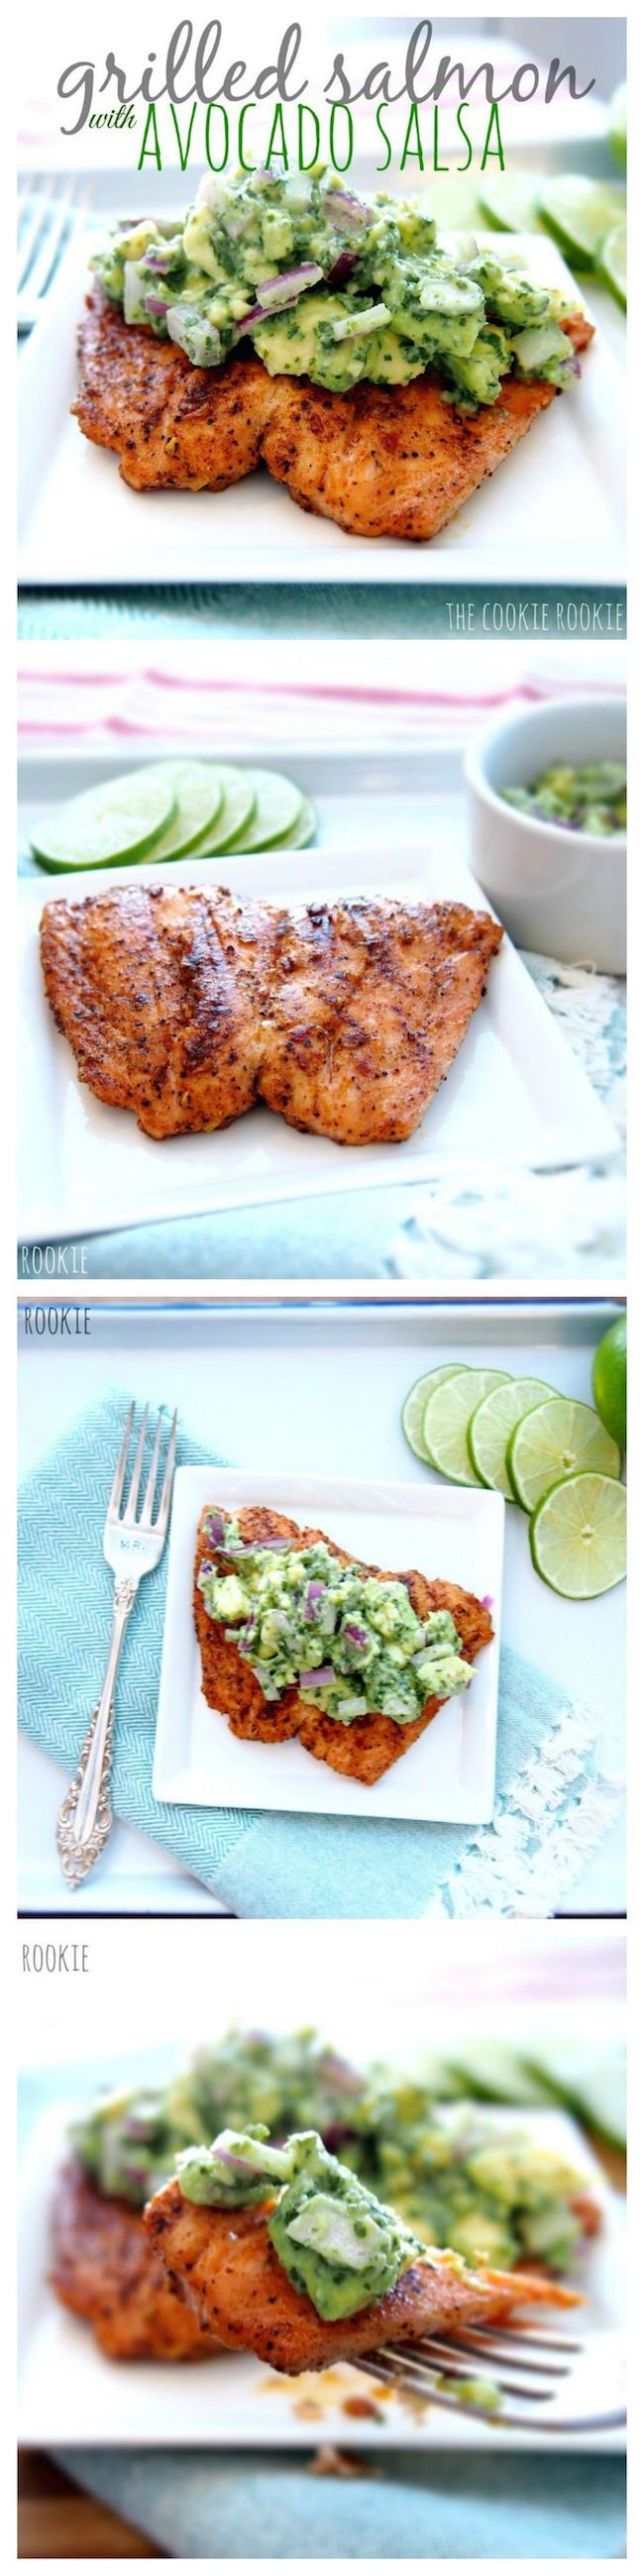 Salmon with Avocado